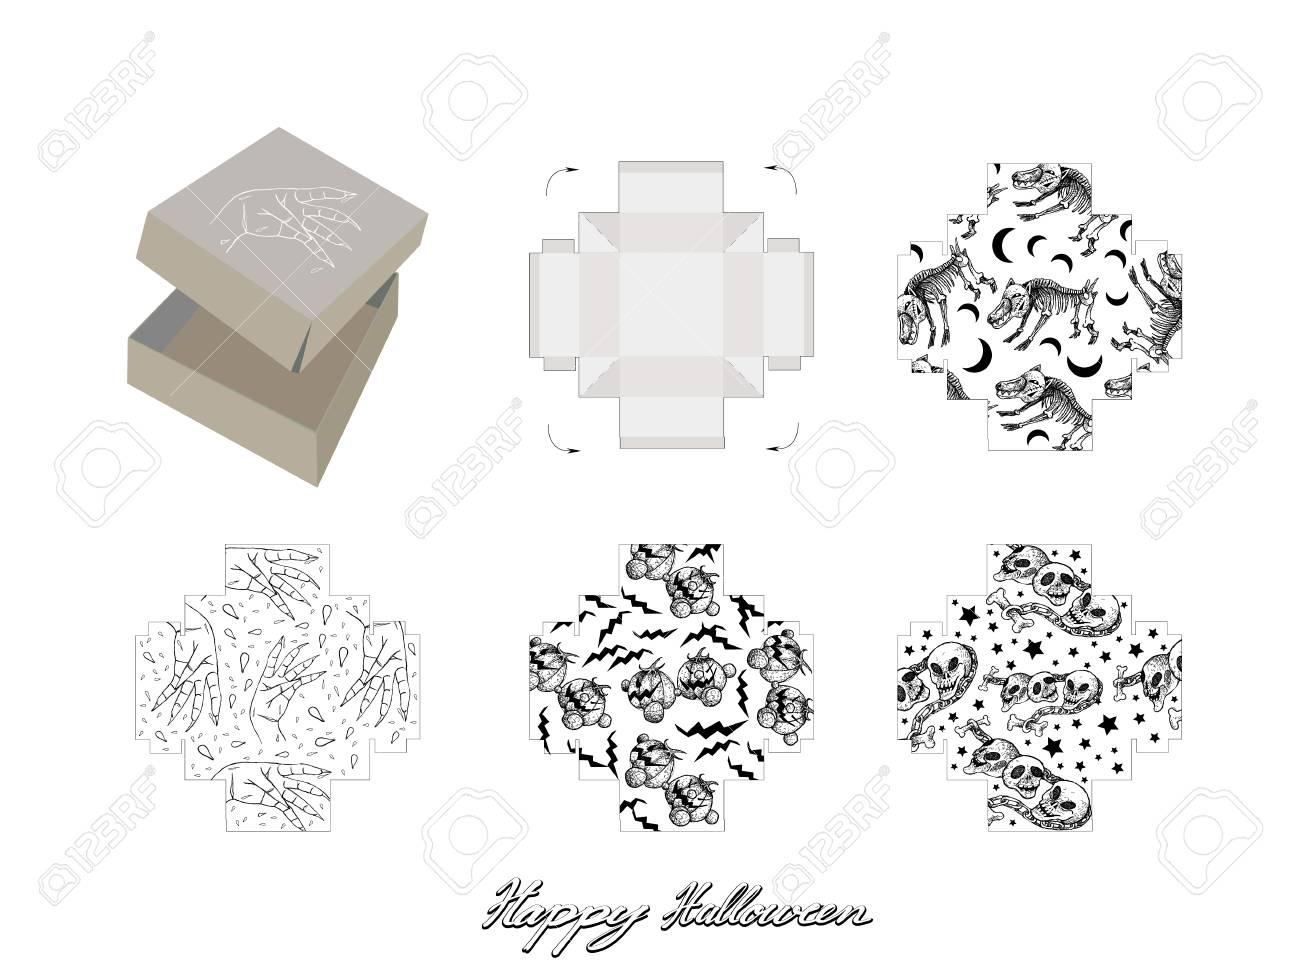 die cut template pattern of takeaway carton box mock up for package